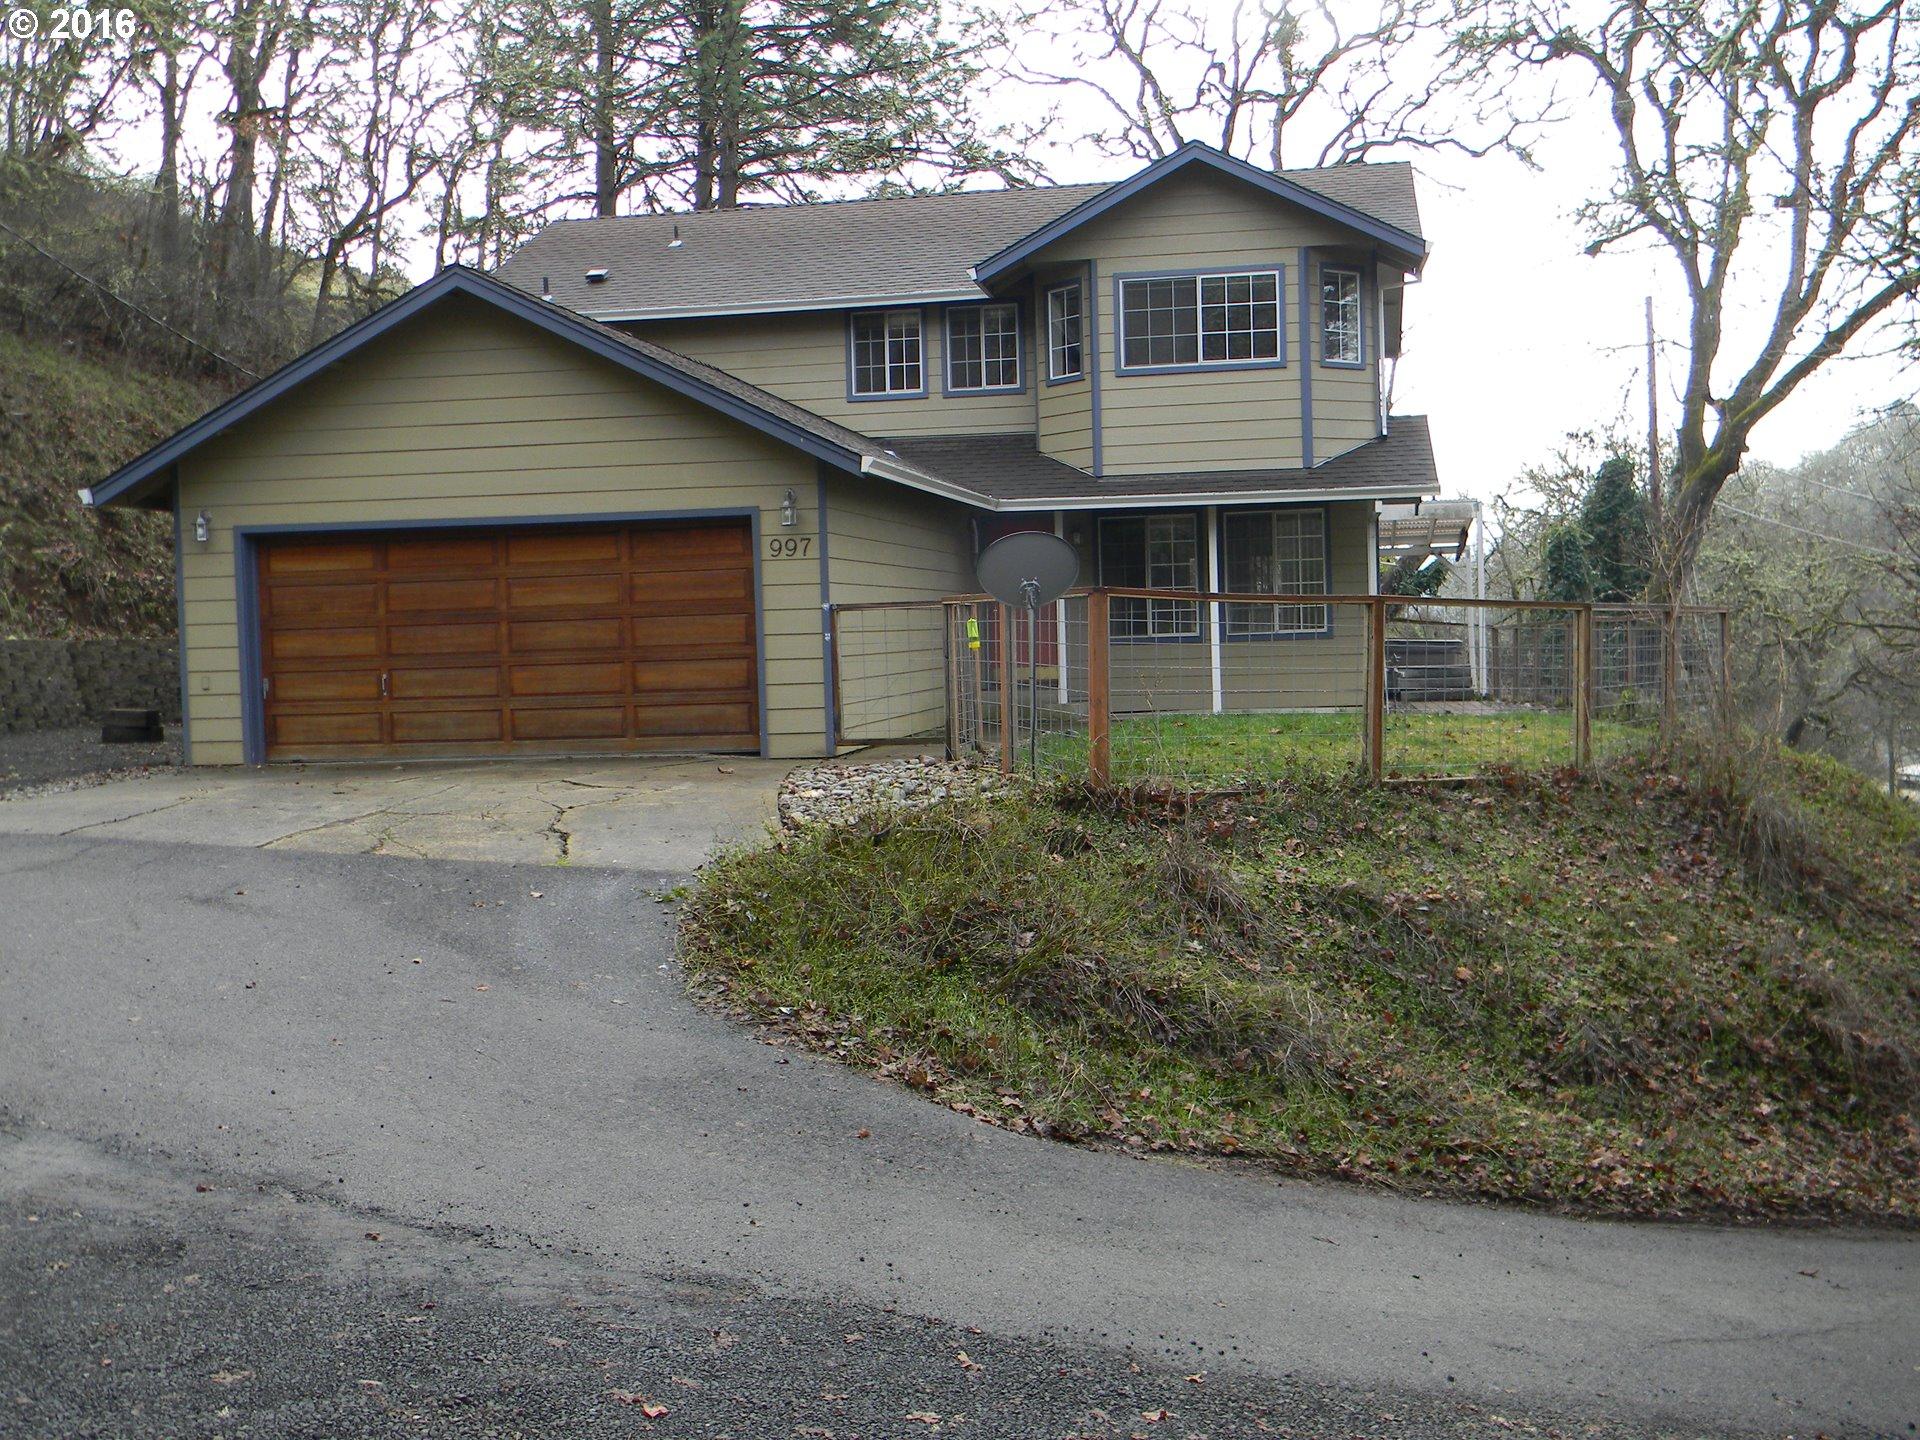 997 NE Grandview Dr, Roseburg, OR